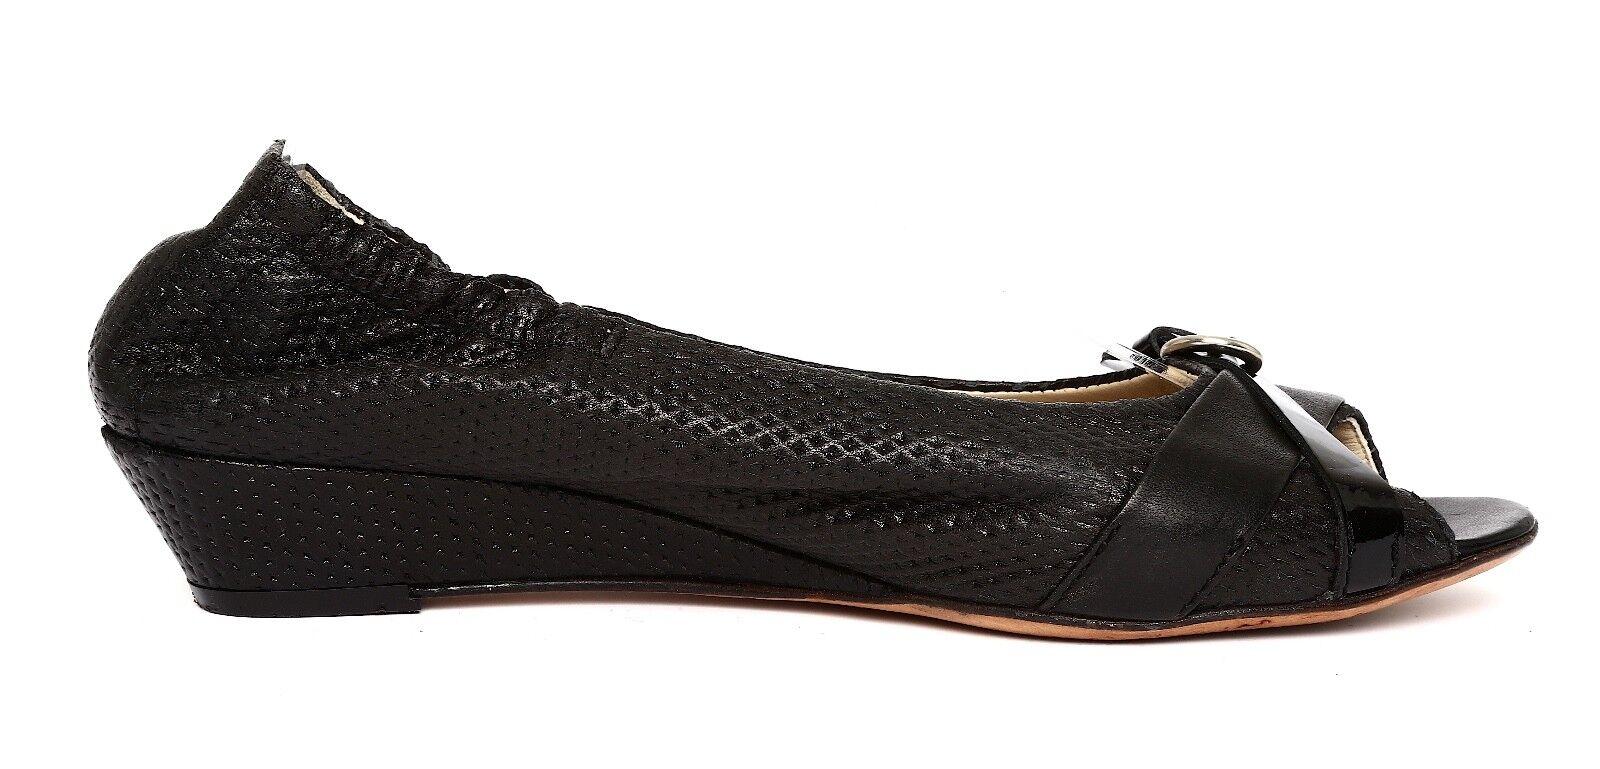 Attilio Giusti Leombruni Women's Black Leather Wedge Pump Sz 36.5 EUR 4192